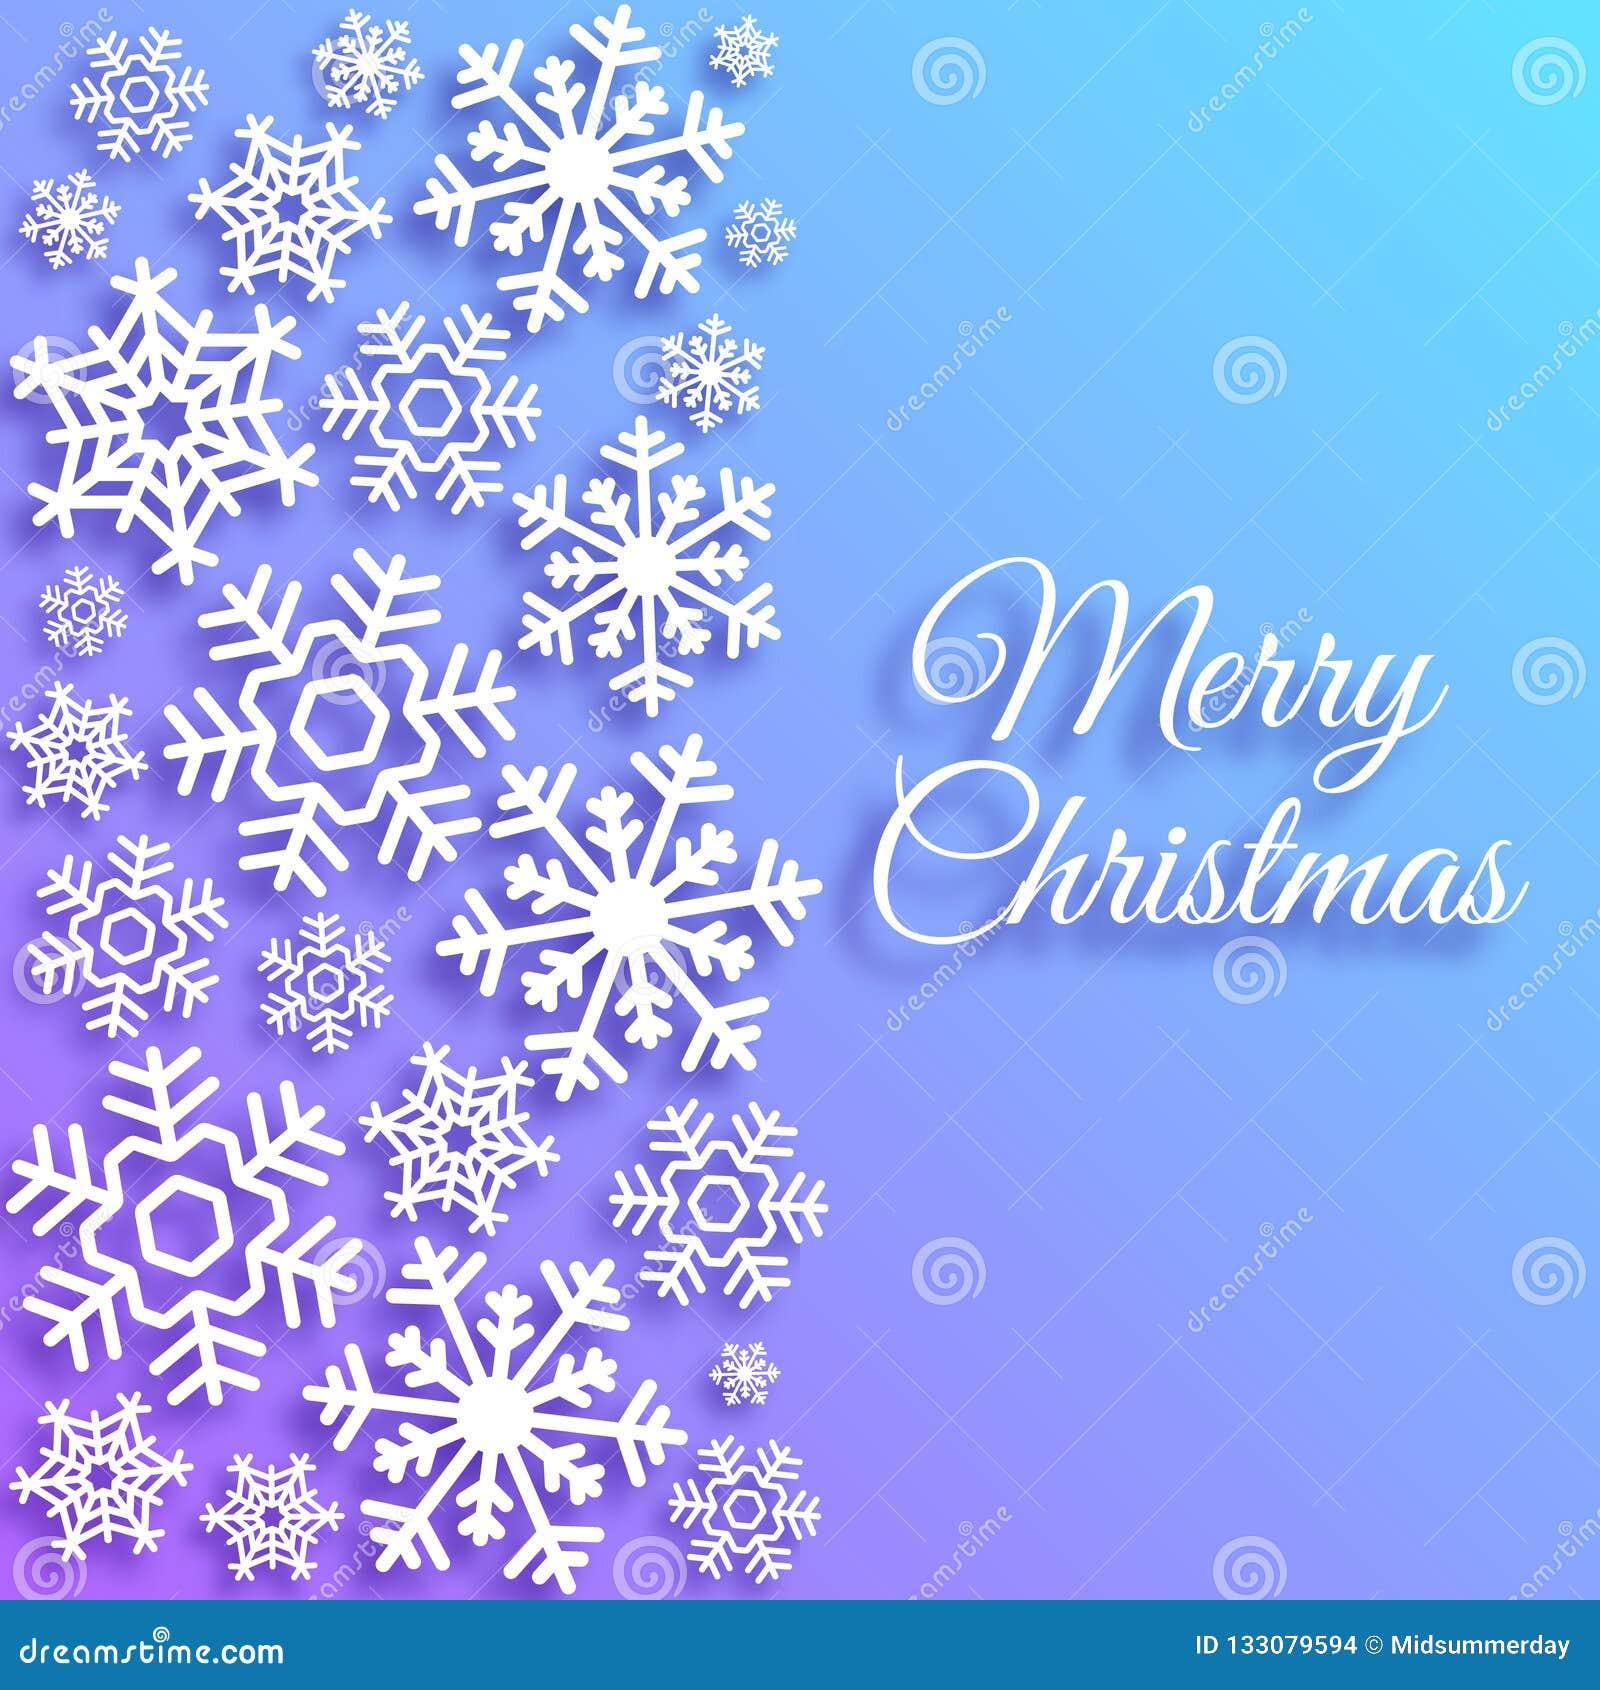 Auguri Di Buon Natale Eleganti.Cartolina D Auguri Di Buon Natale Con I Fiocchi Di Neve Bianchi